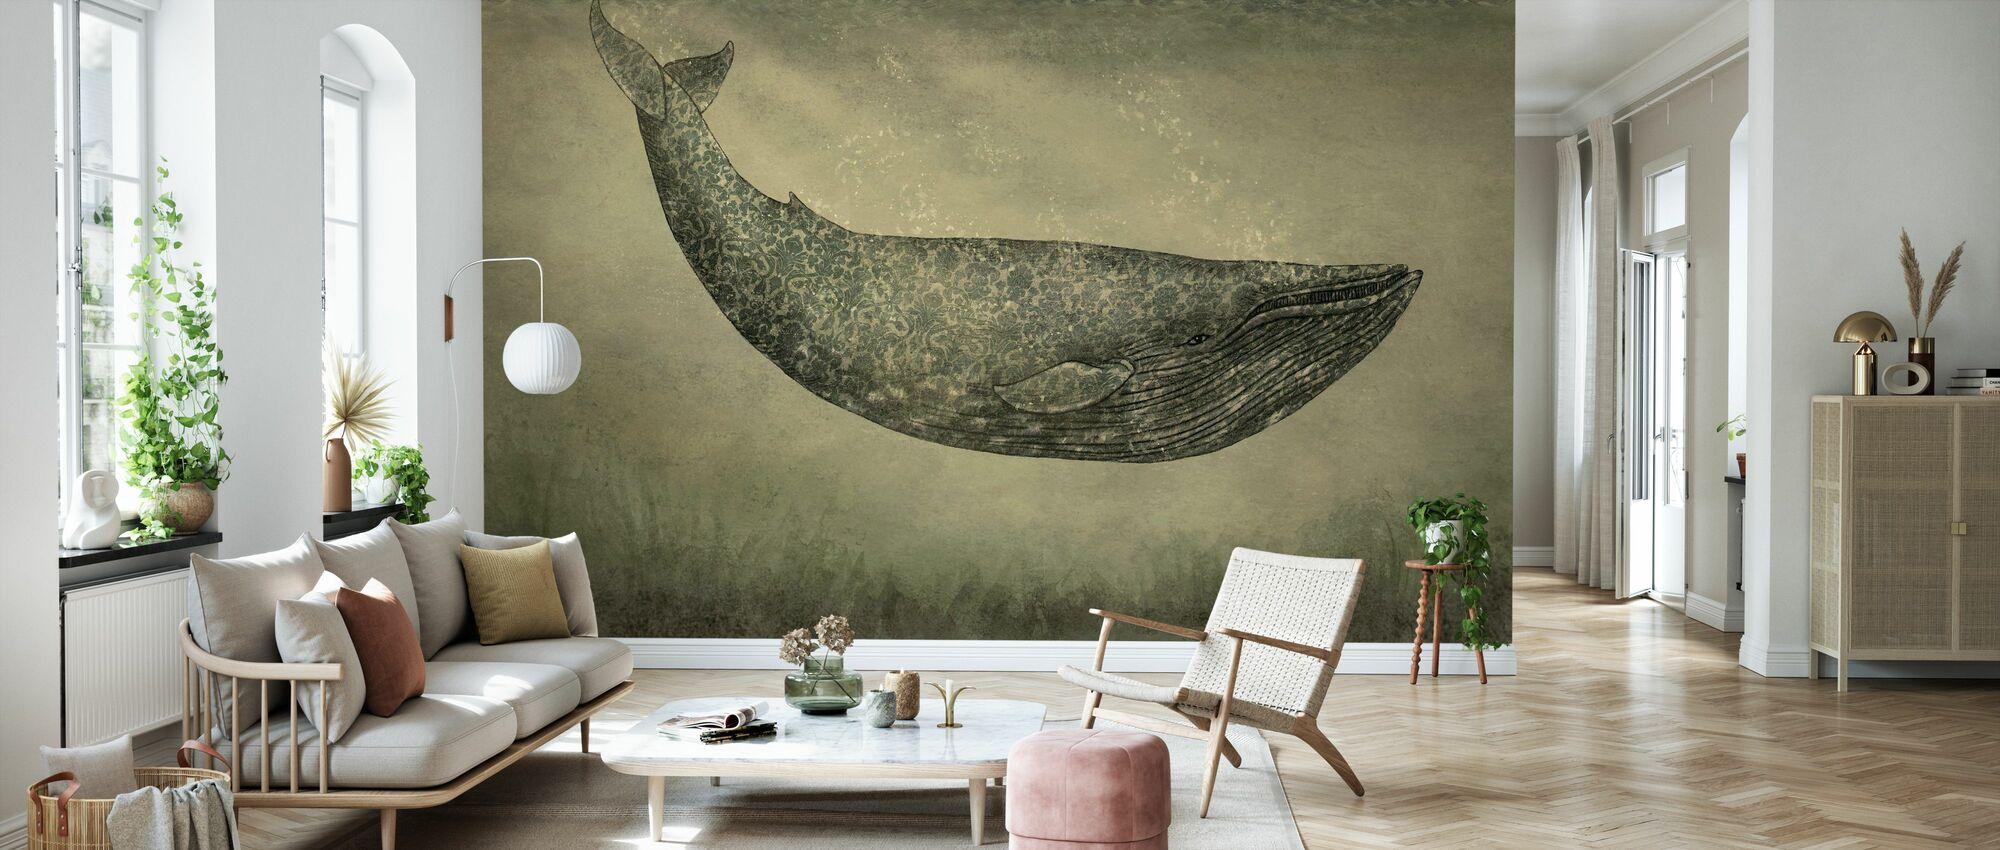 Damask Whale - Wallpaper - Living Room